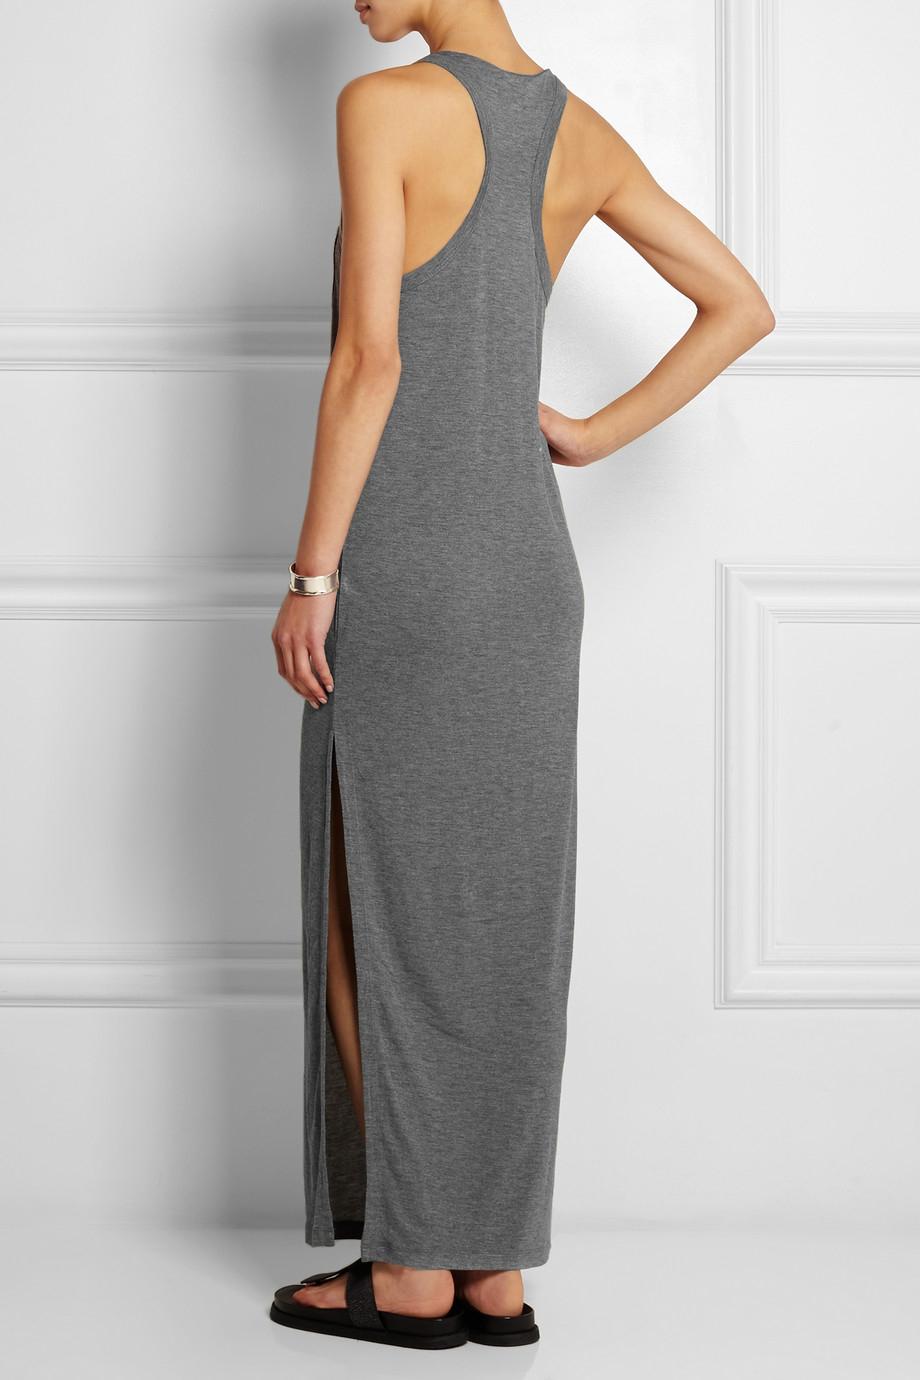 T by alexander wang Jersey Maxi Dress in Gray - Lyst